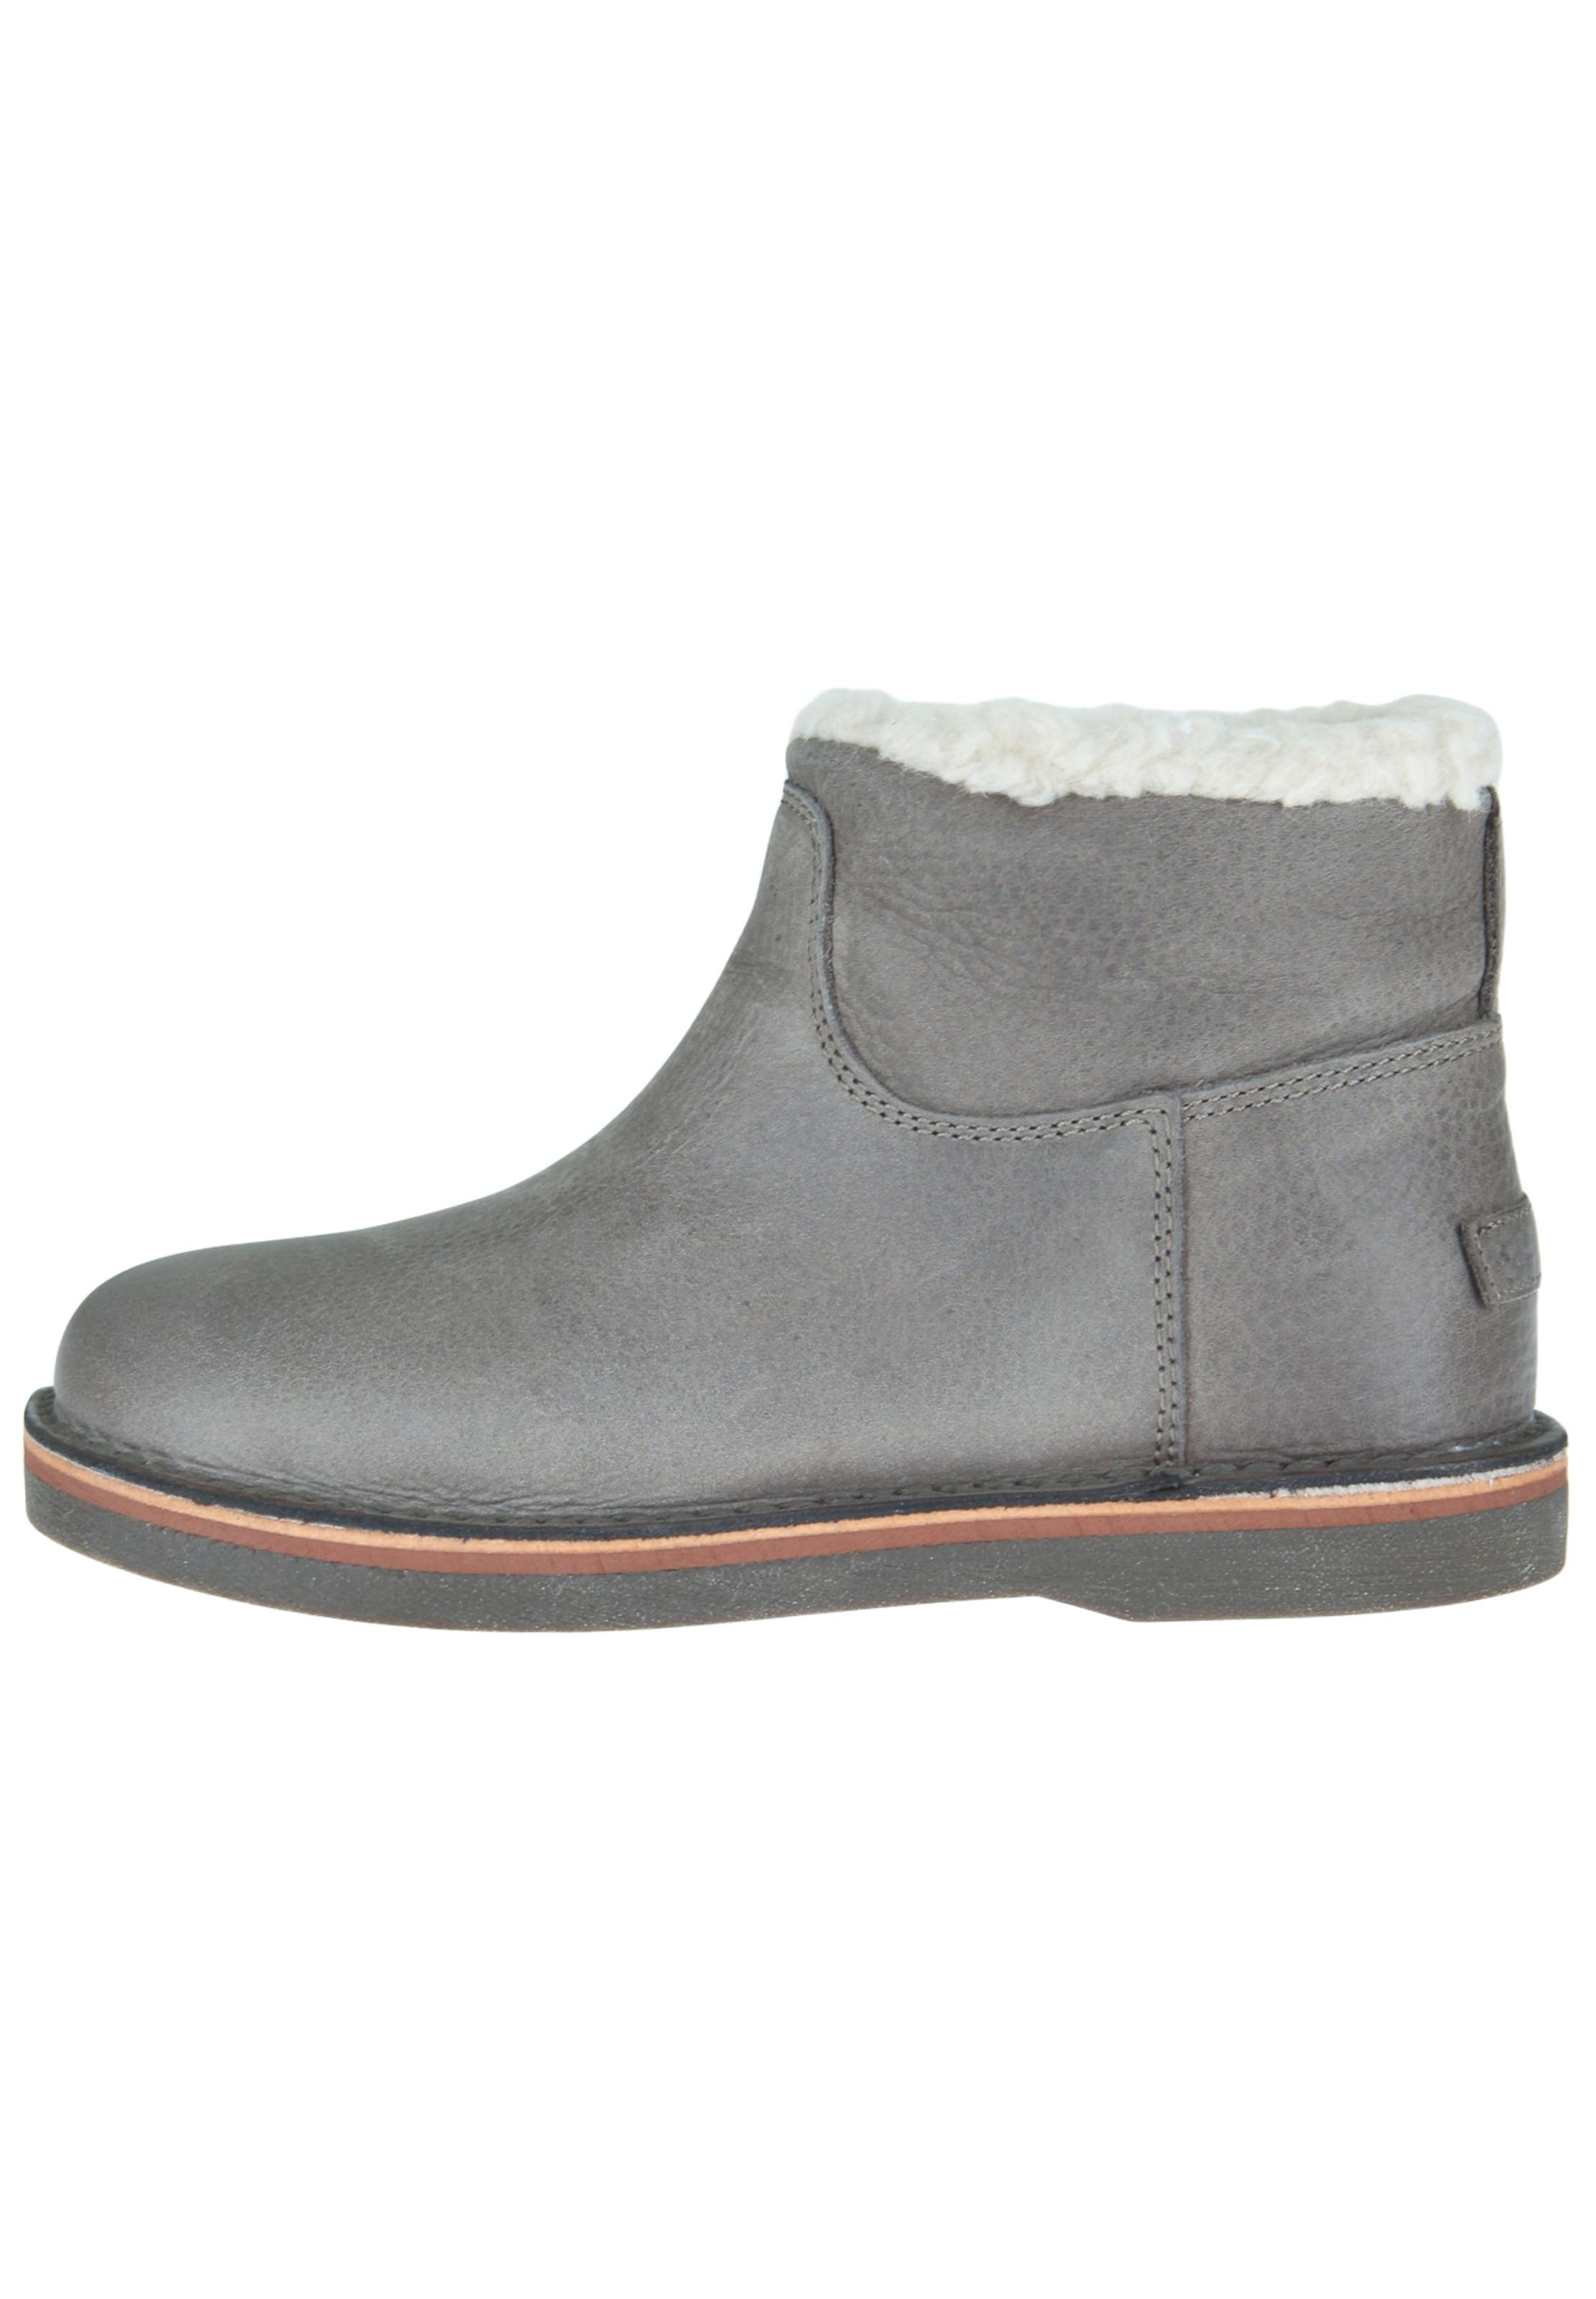 SHABBIES AMSTERDAM Boots MINI BOOTY